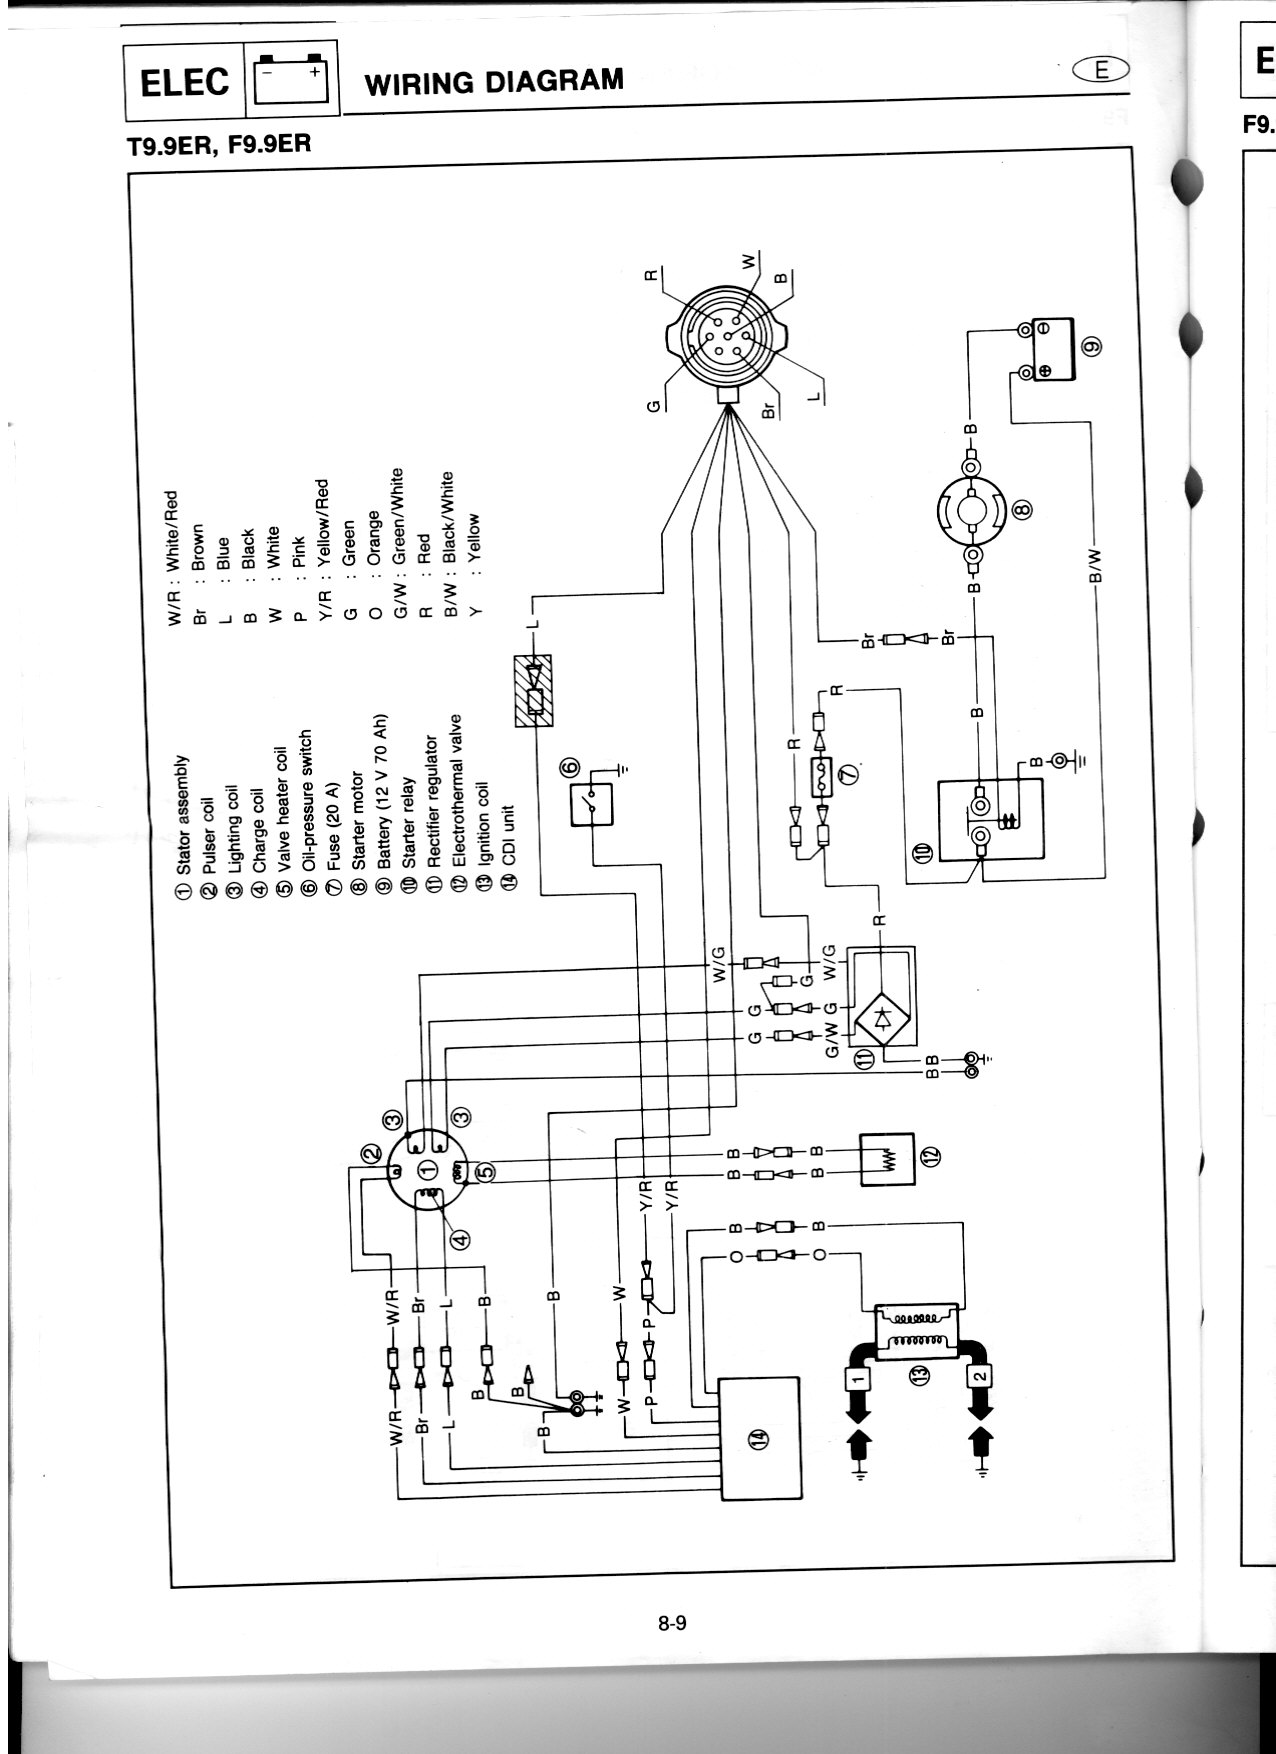 T9.9_Wiring_Diag?resize\=665%2C914 yamaha hpdi 200 wiring diagram yamaha 200 saltwater series yamaha 200 outboard wiring diagram at nearapp.co